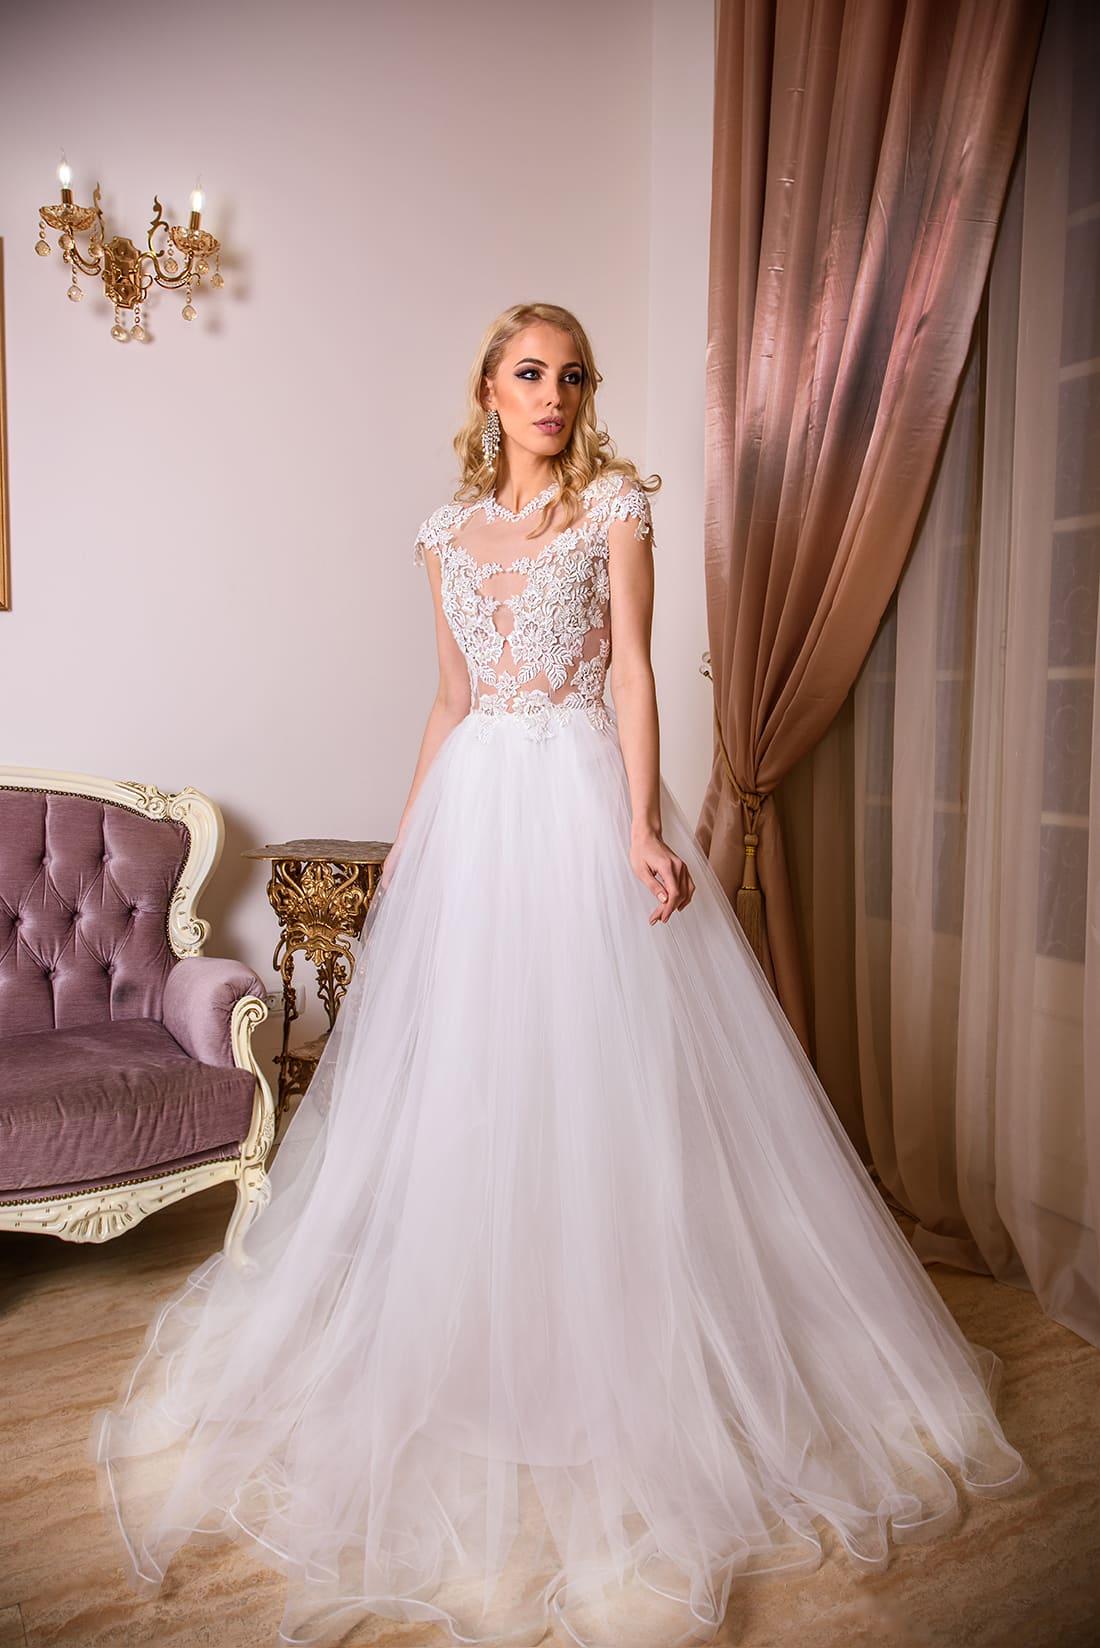 Nicola Model - Colectia Baroque - Adora Sposa